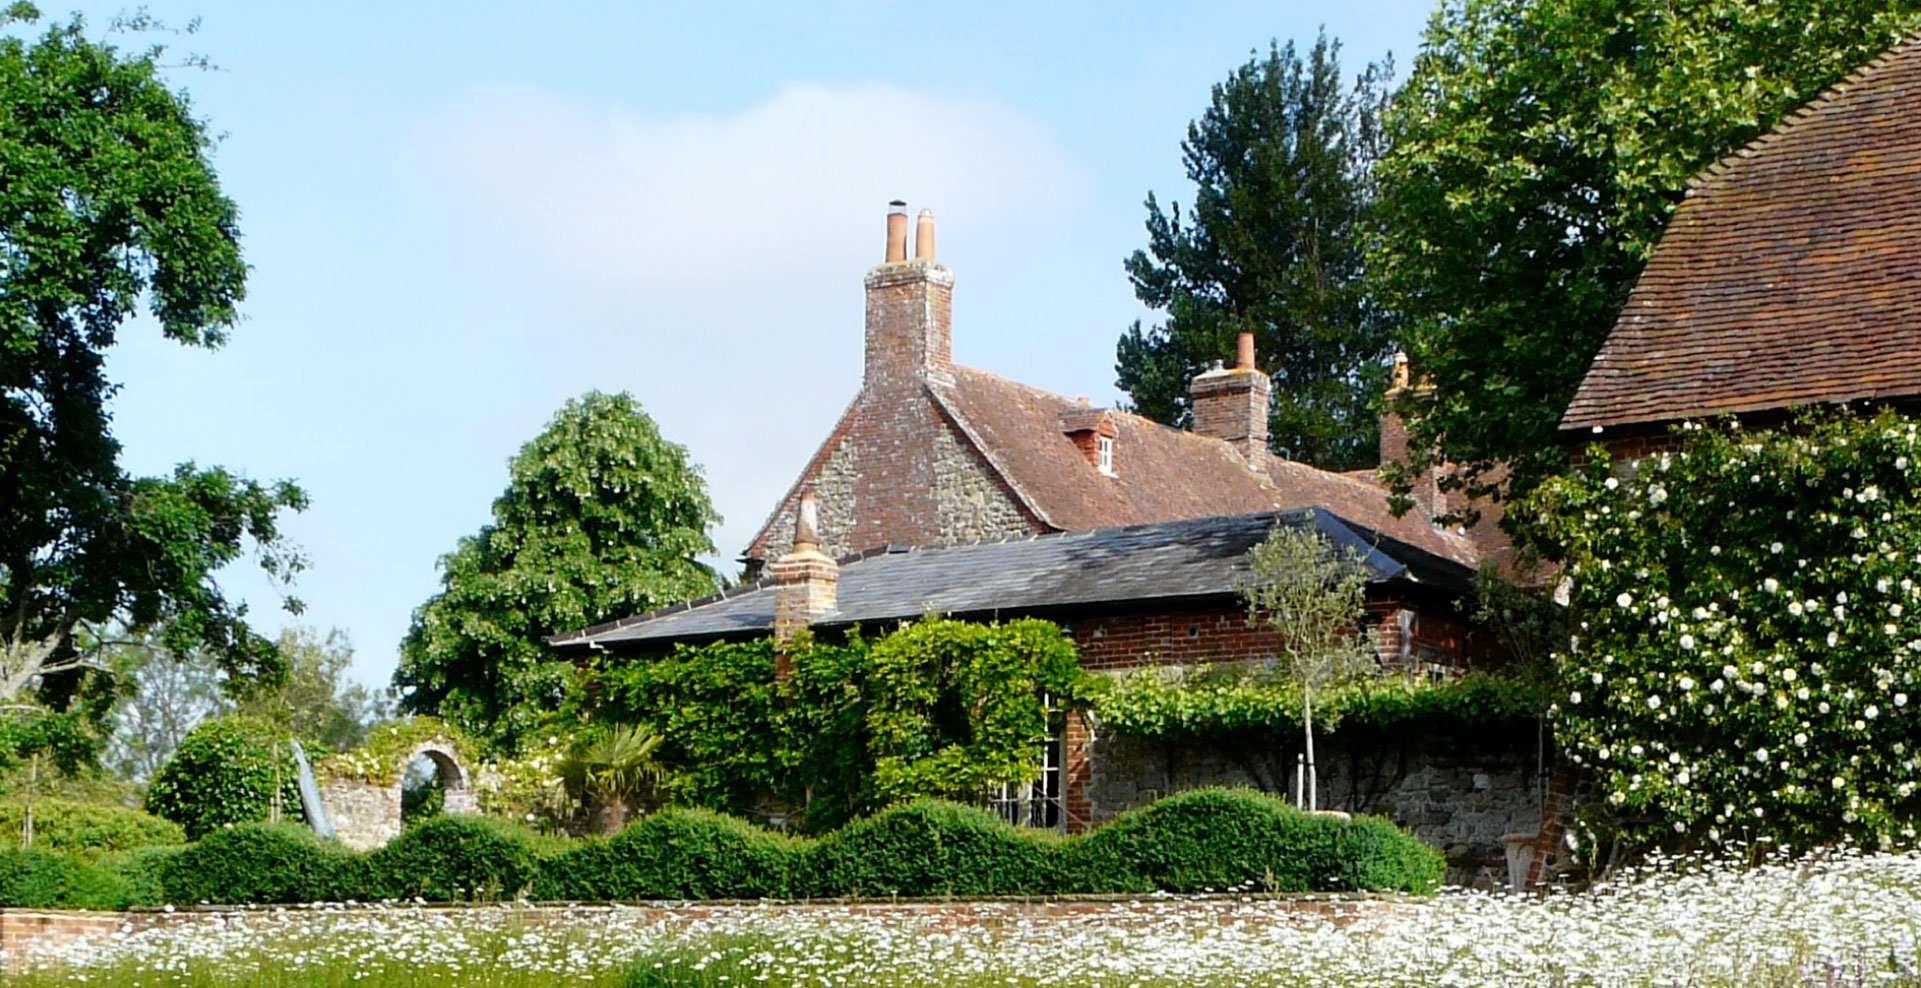 Designer Ann-Marie Powell in her Petersfield, Hampshire garden.